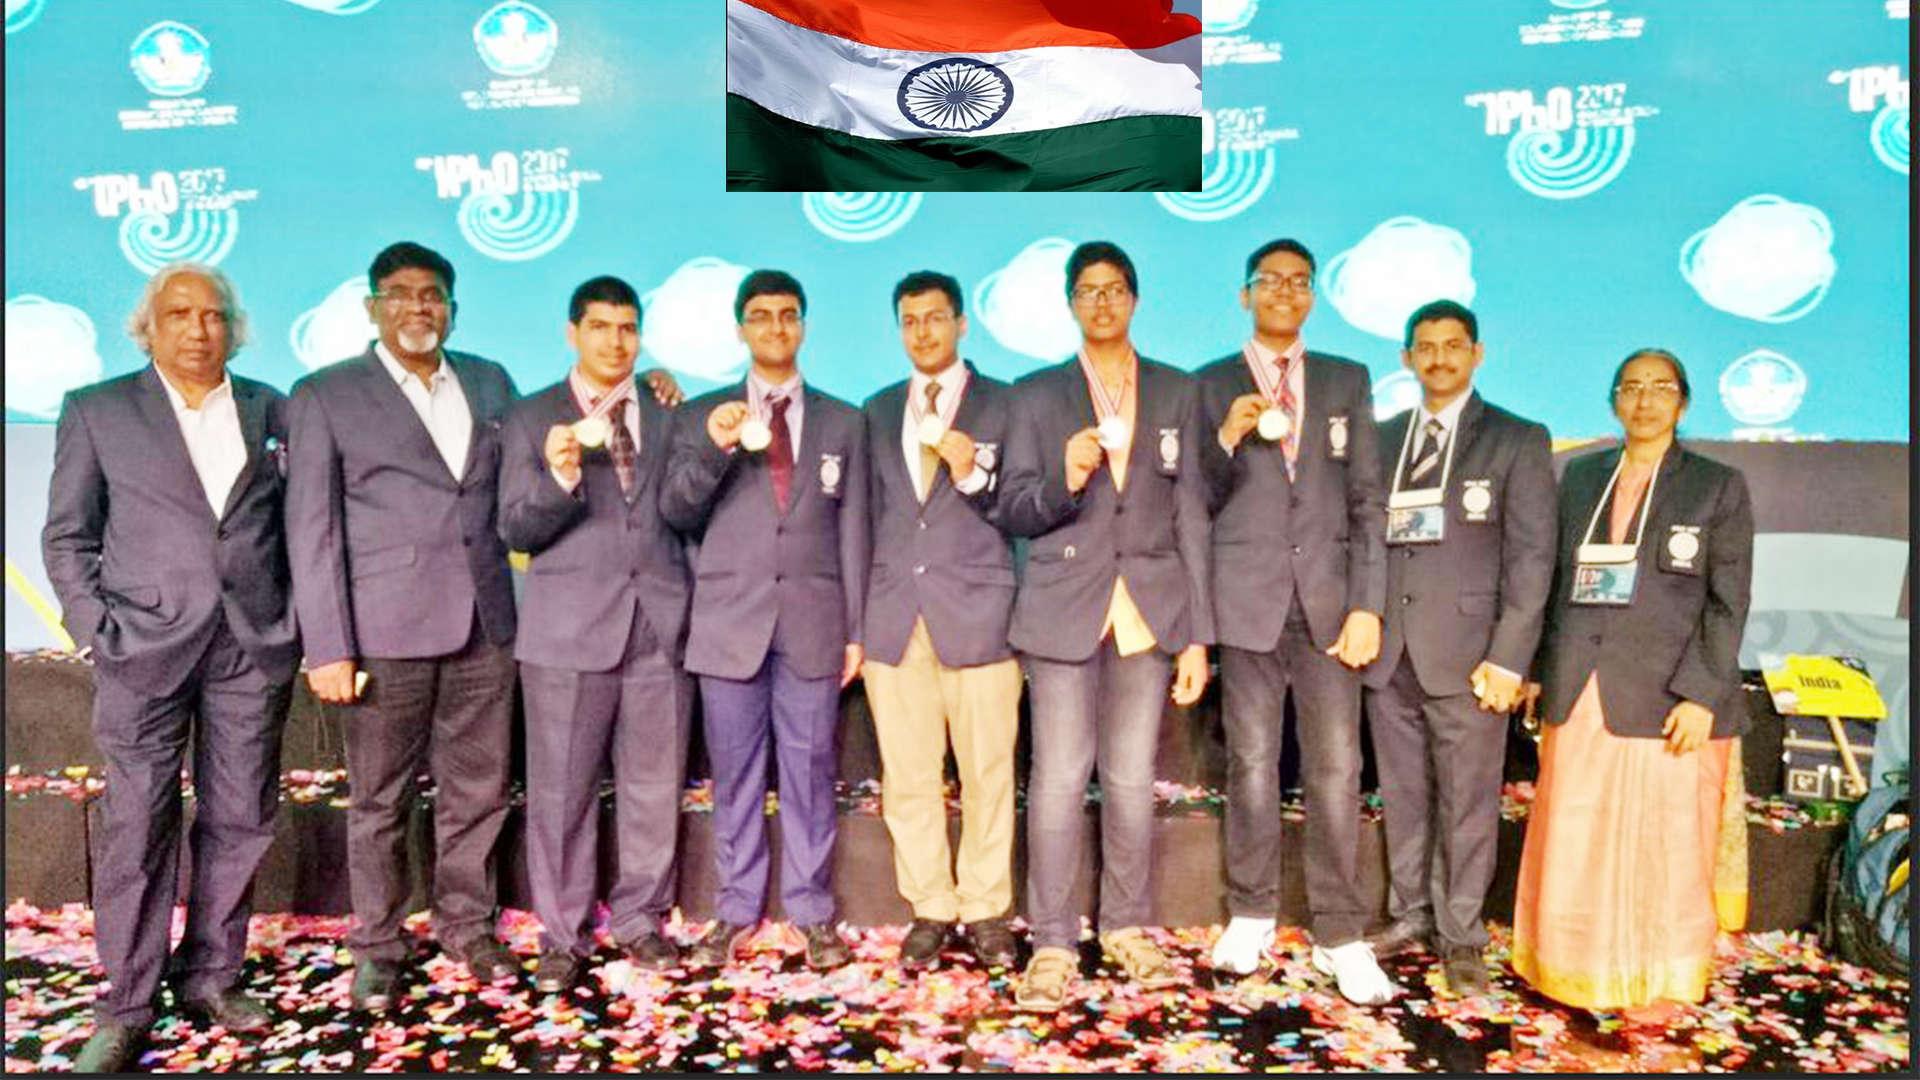 5 participants, 5 gold: India shines at Physics Olympiad